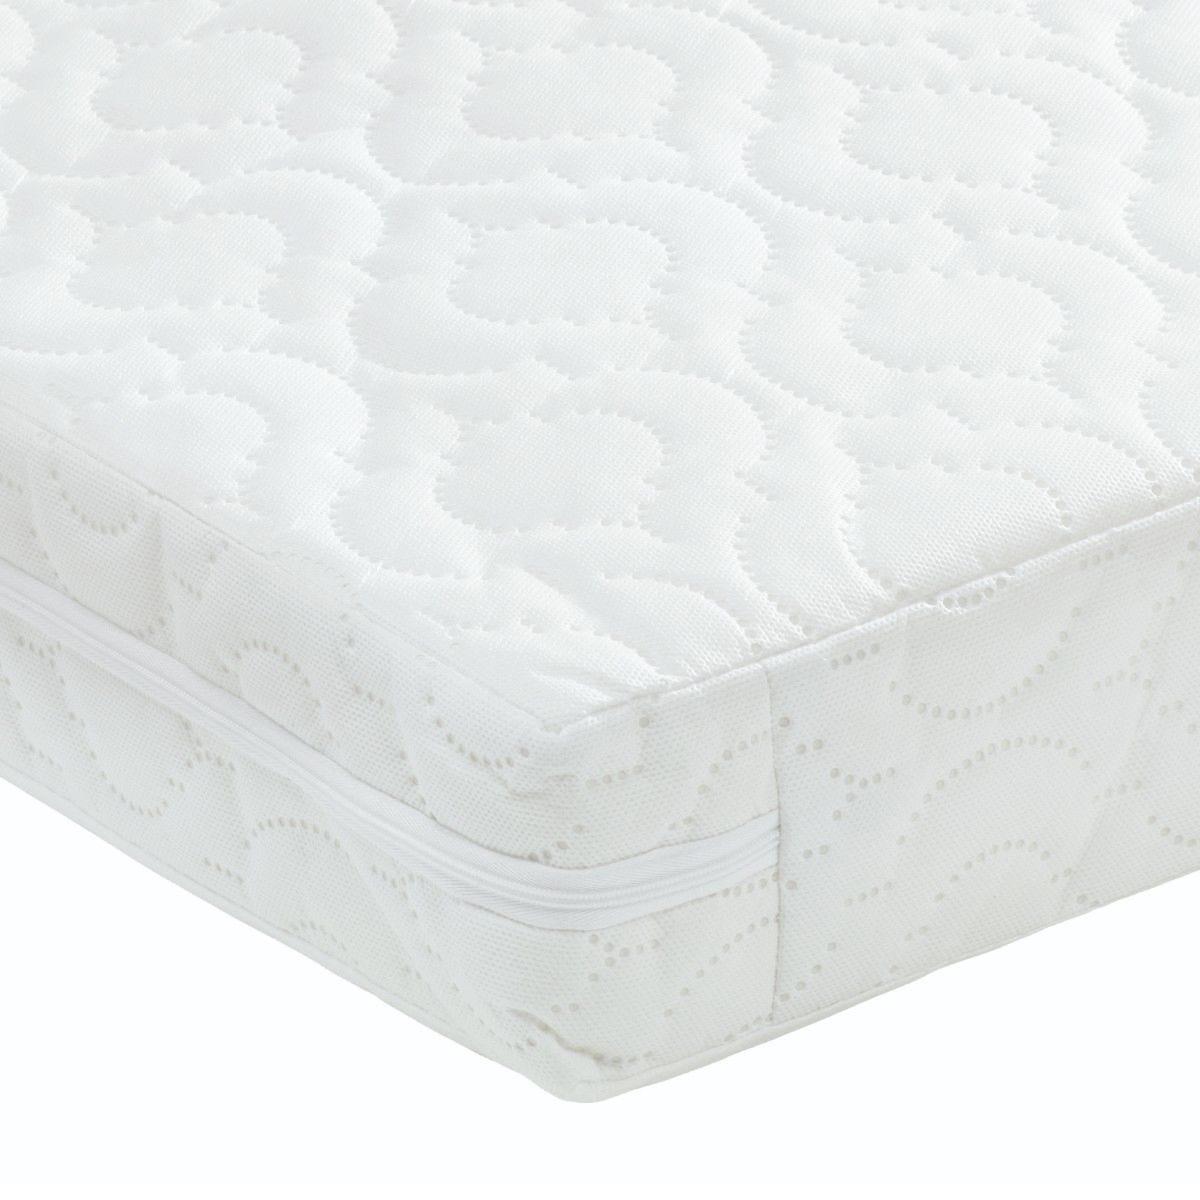 Babymore Premium Dual Core Pocket Sprung Cot Bed Mattress 140 x 70 x 10 CM